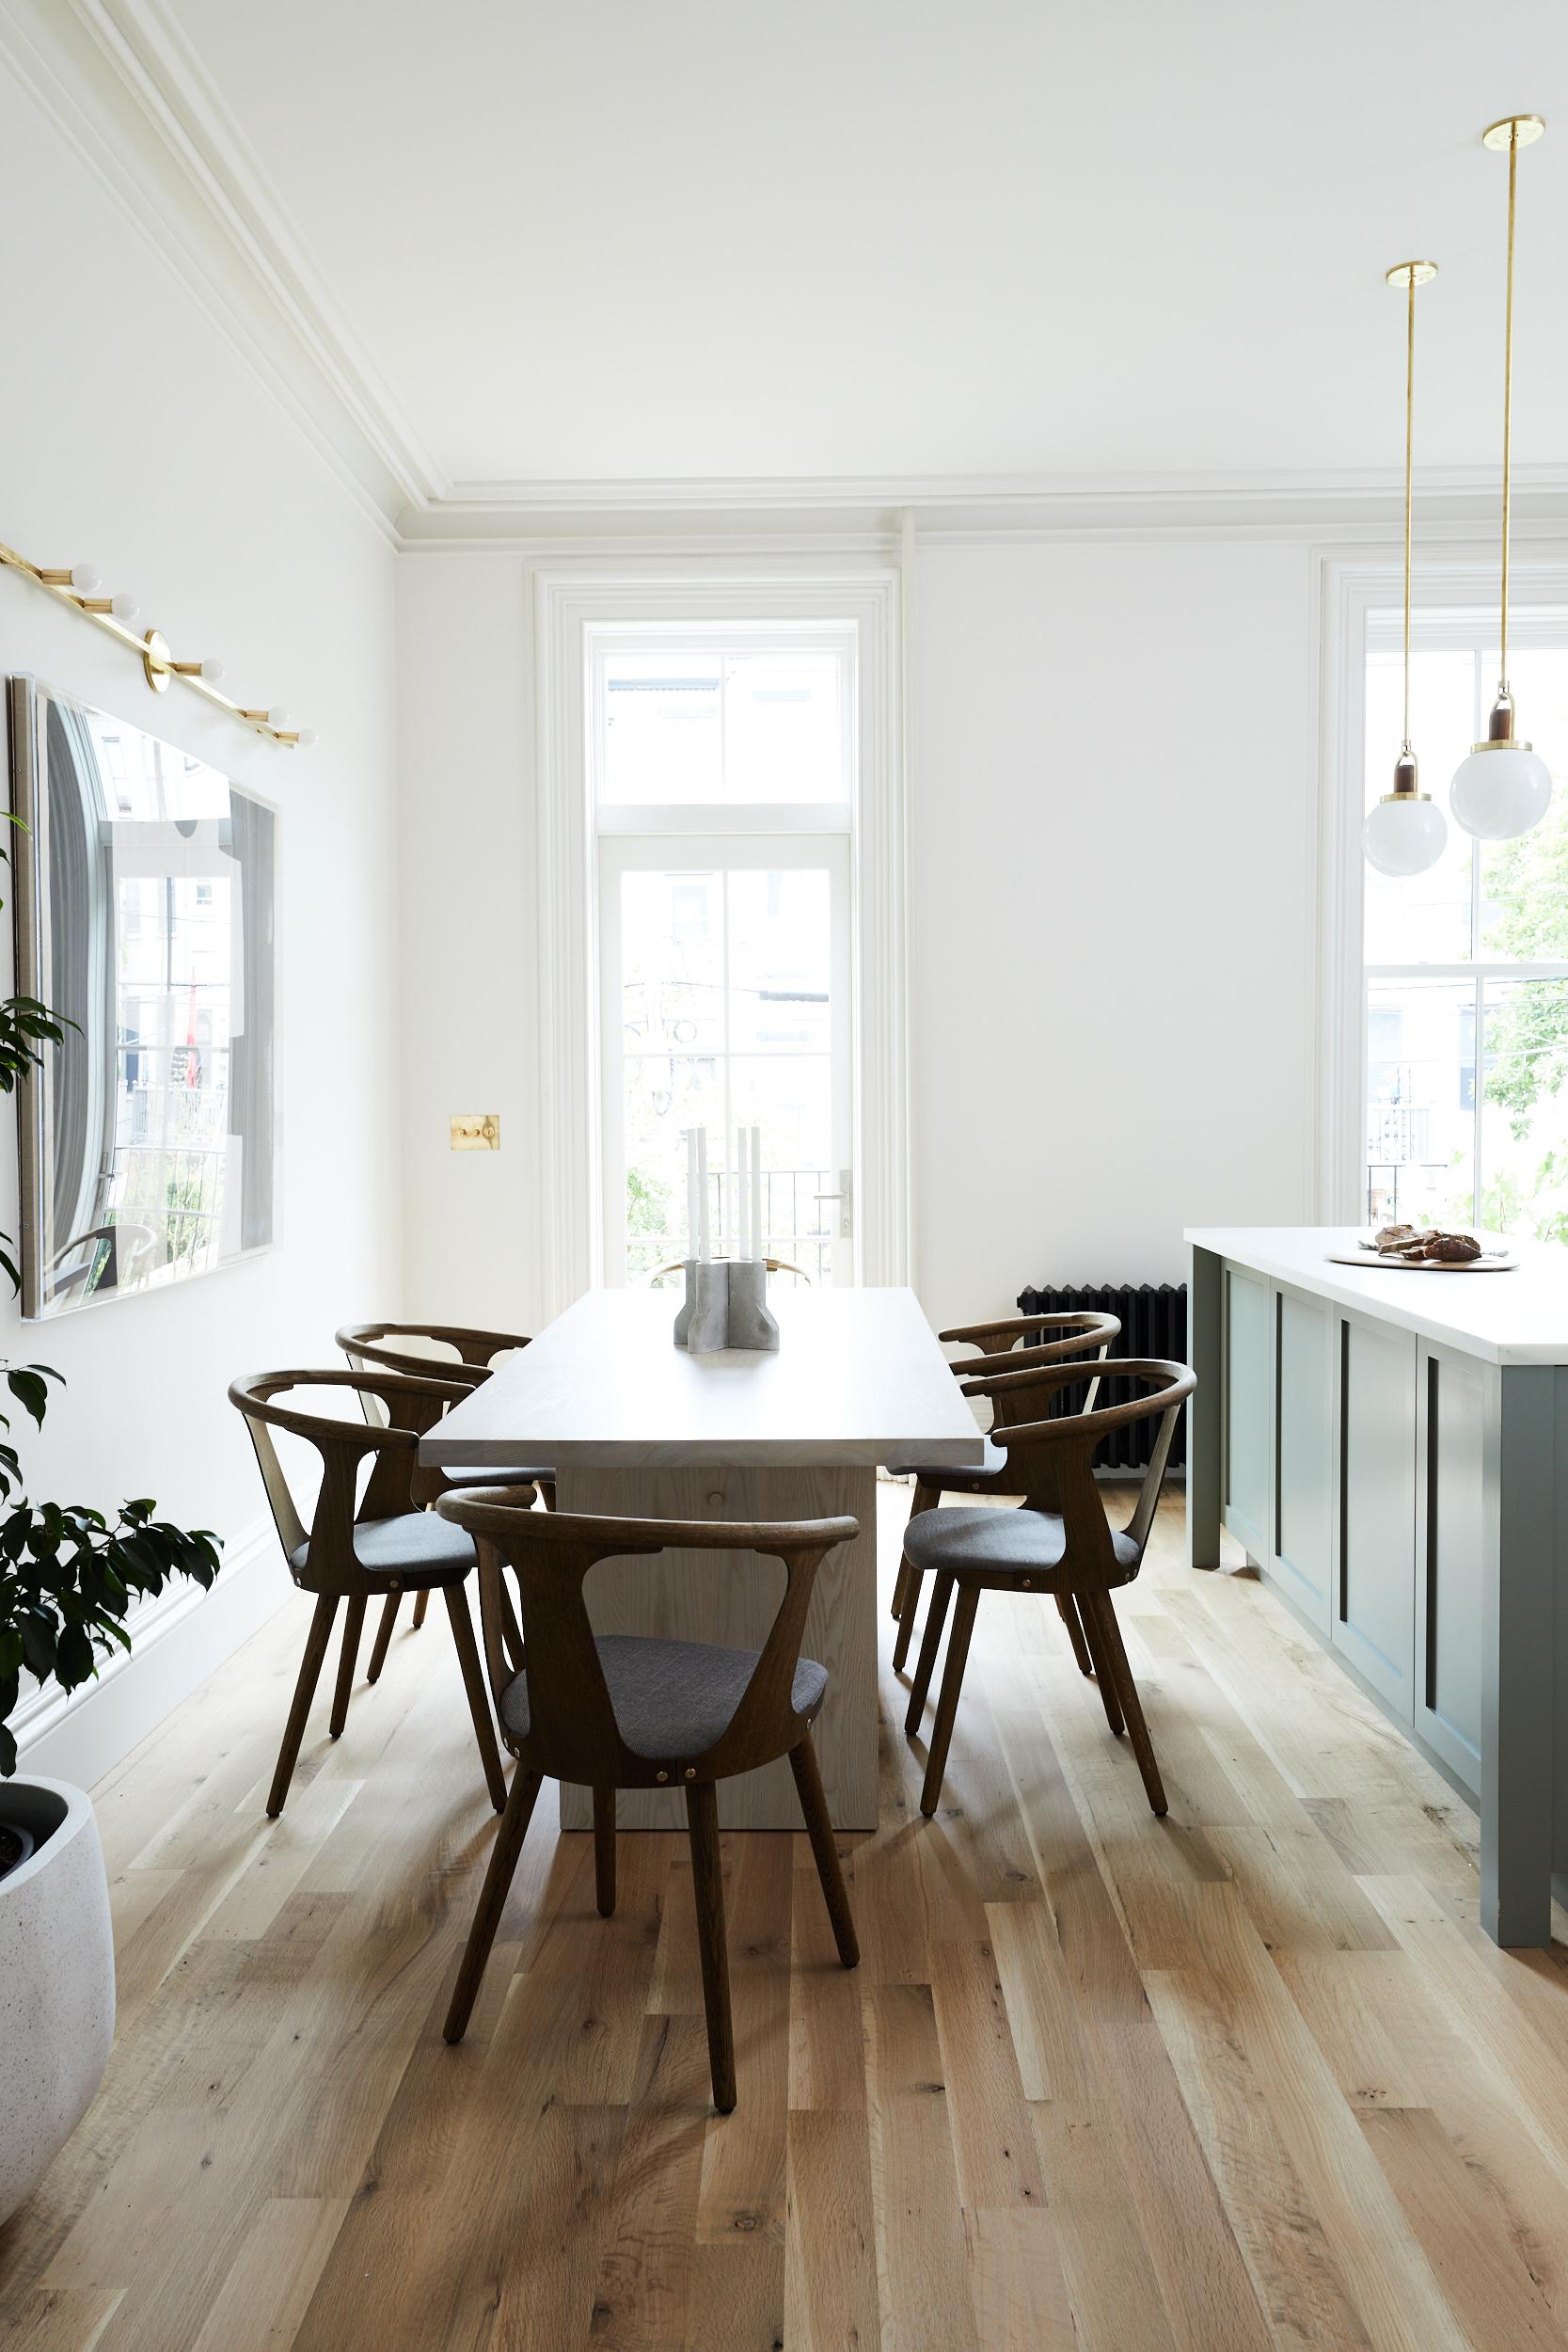 5. Dining Room Slope_Townhouse_Dining_Room_019.jpg